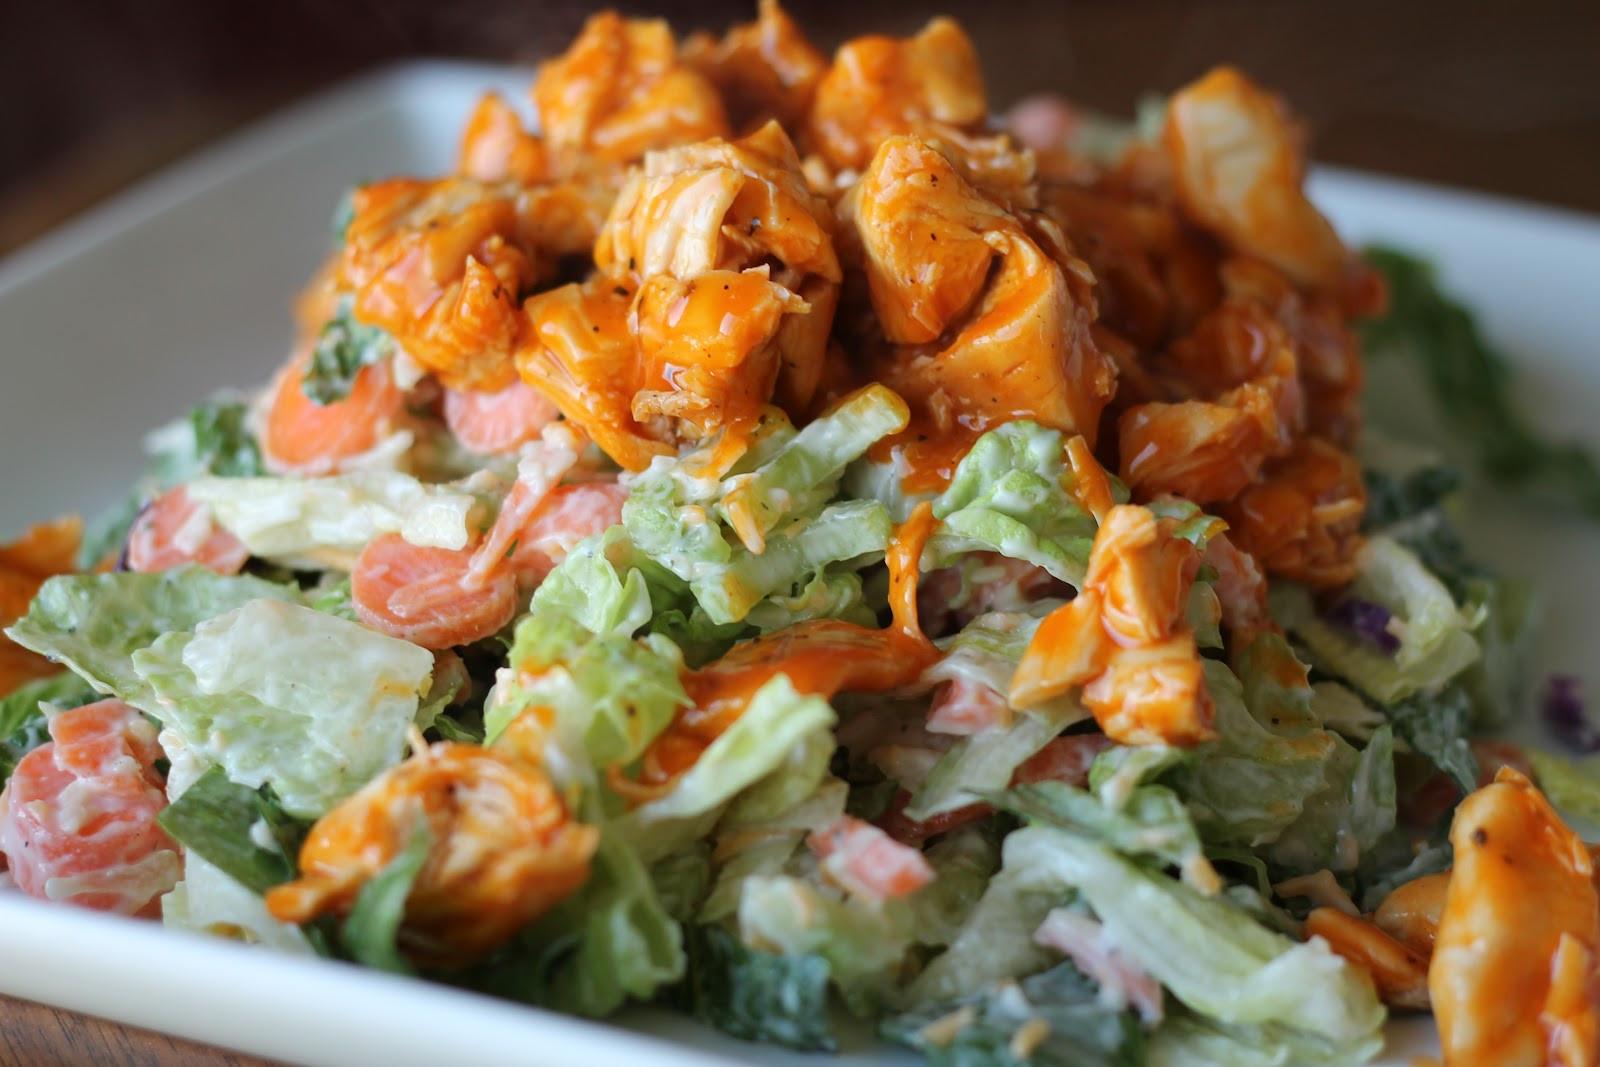 Buffalo Chicken Salad  Mrs Schwartz s Kitchen Chopped Buffalo Chicken Salad